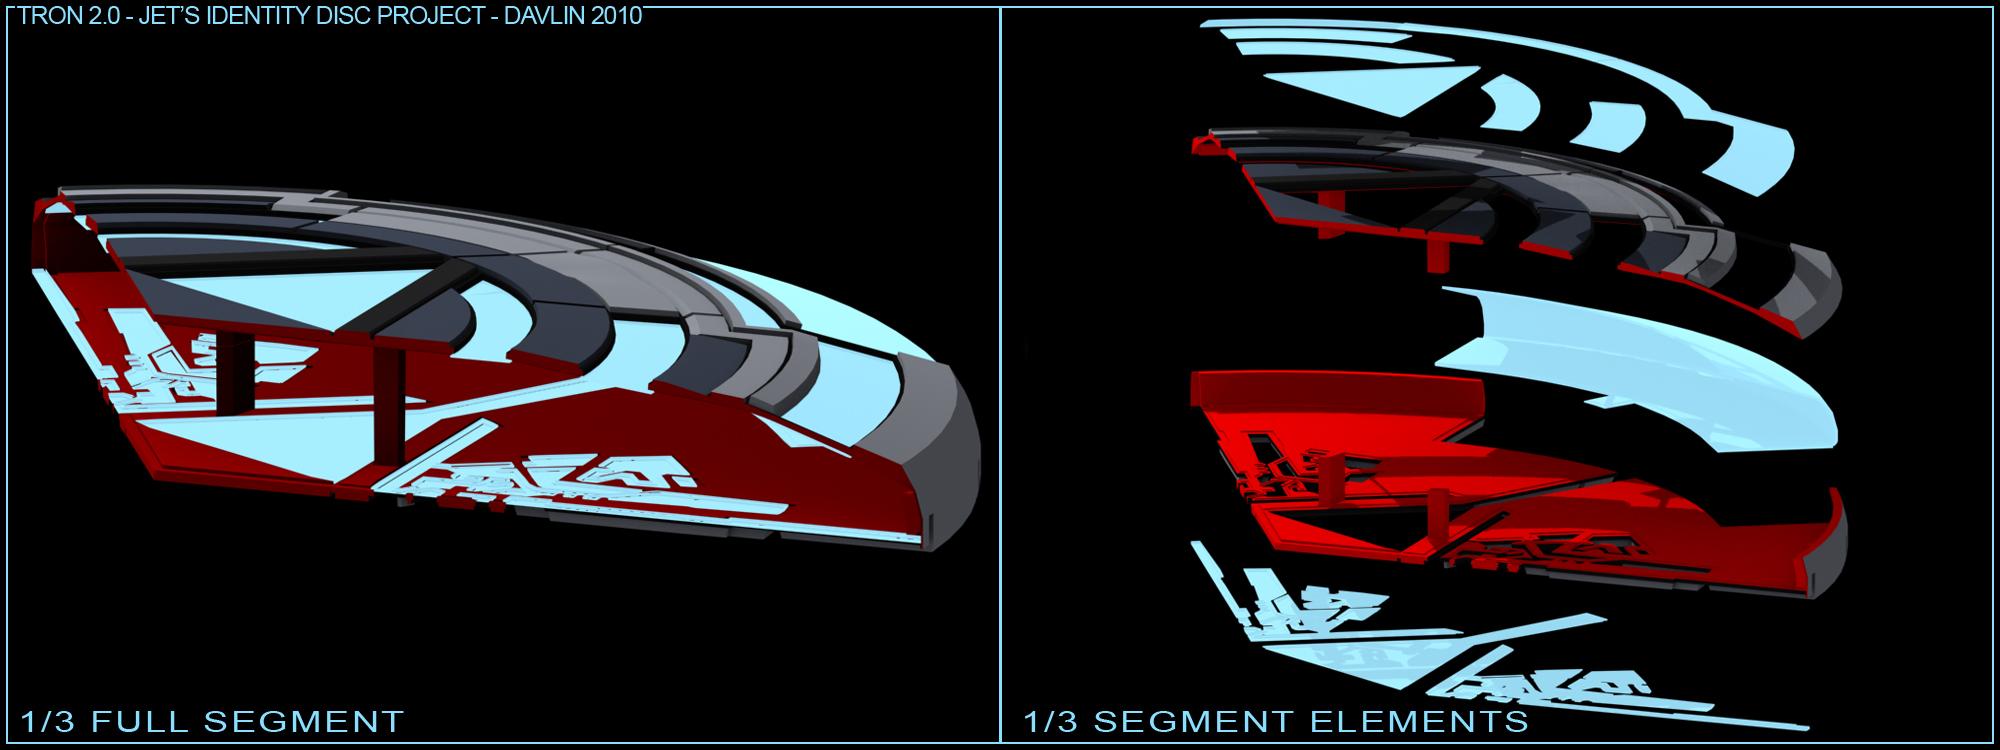 Jet's Identity Disc de Tron 2.0 Techrender